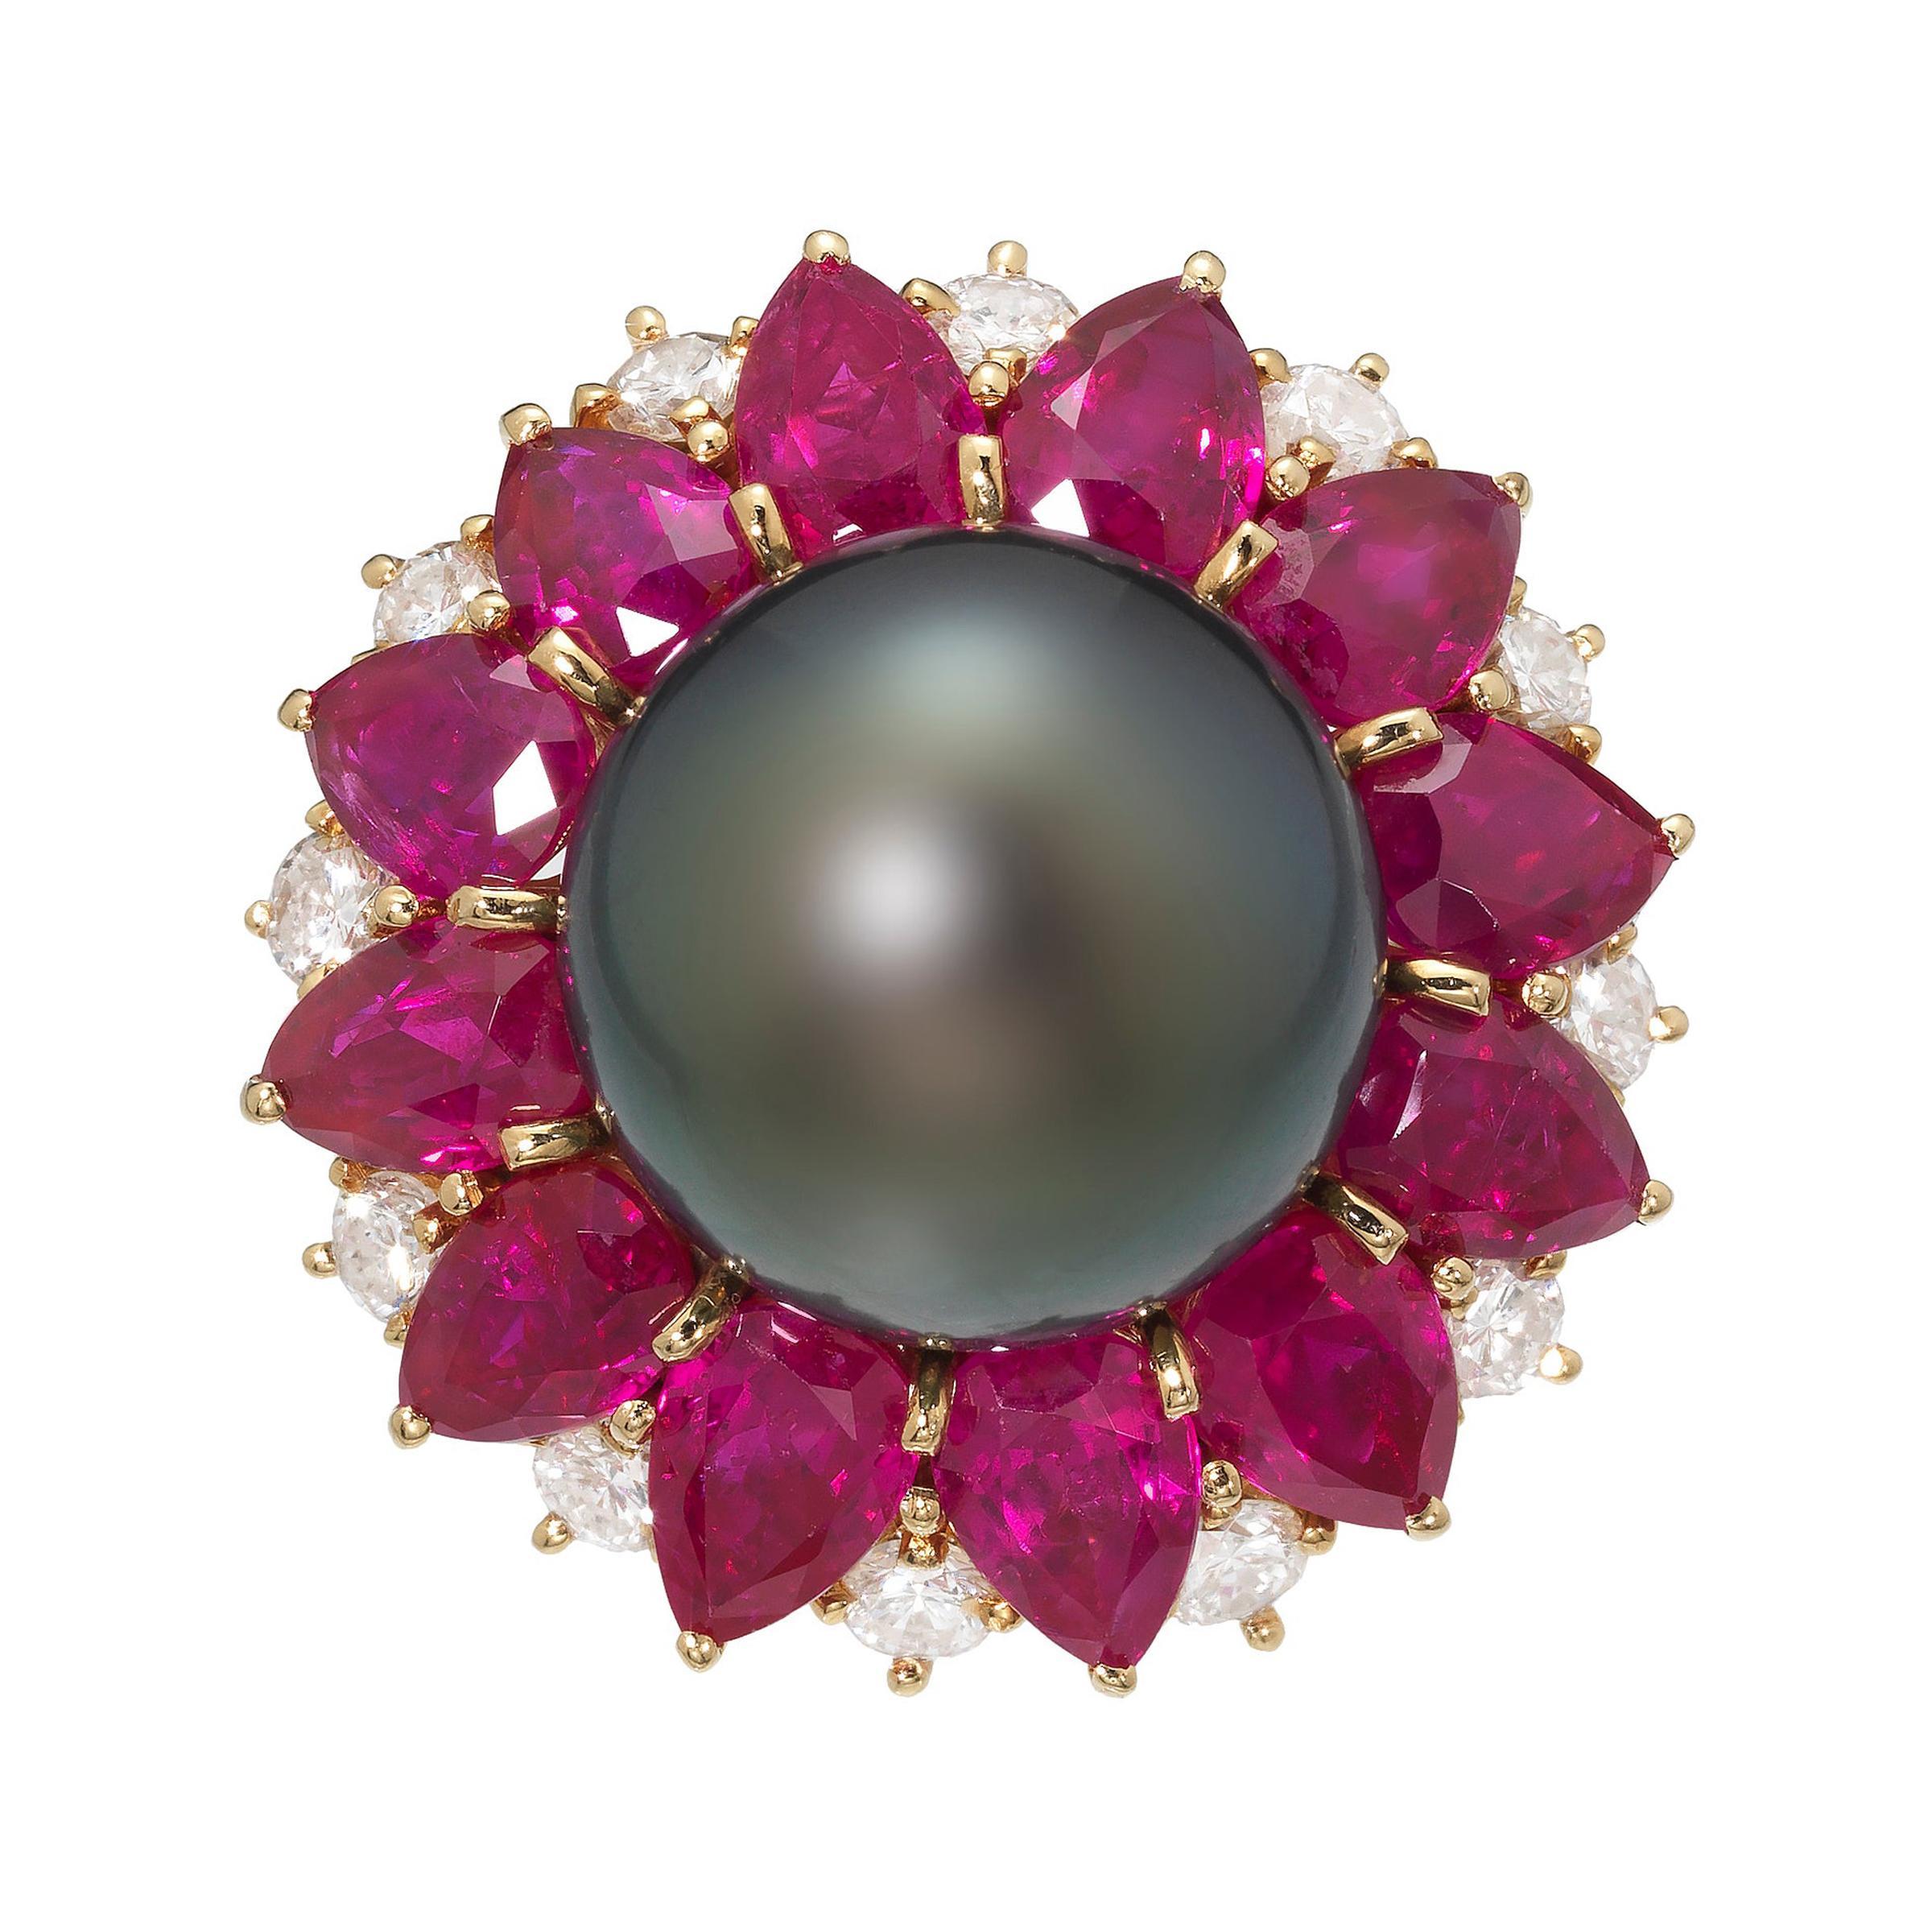 Harry Winston 1970s Diamond Ruby Tahitian Black Pearl Ring in 18K Gold